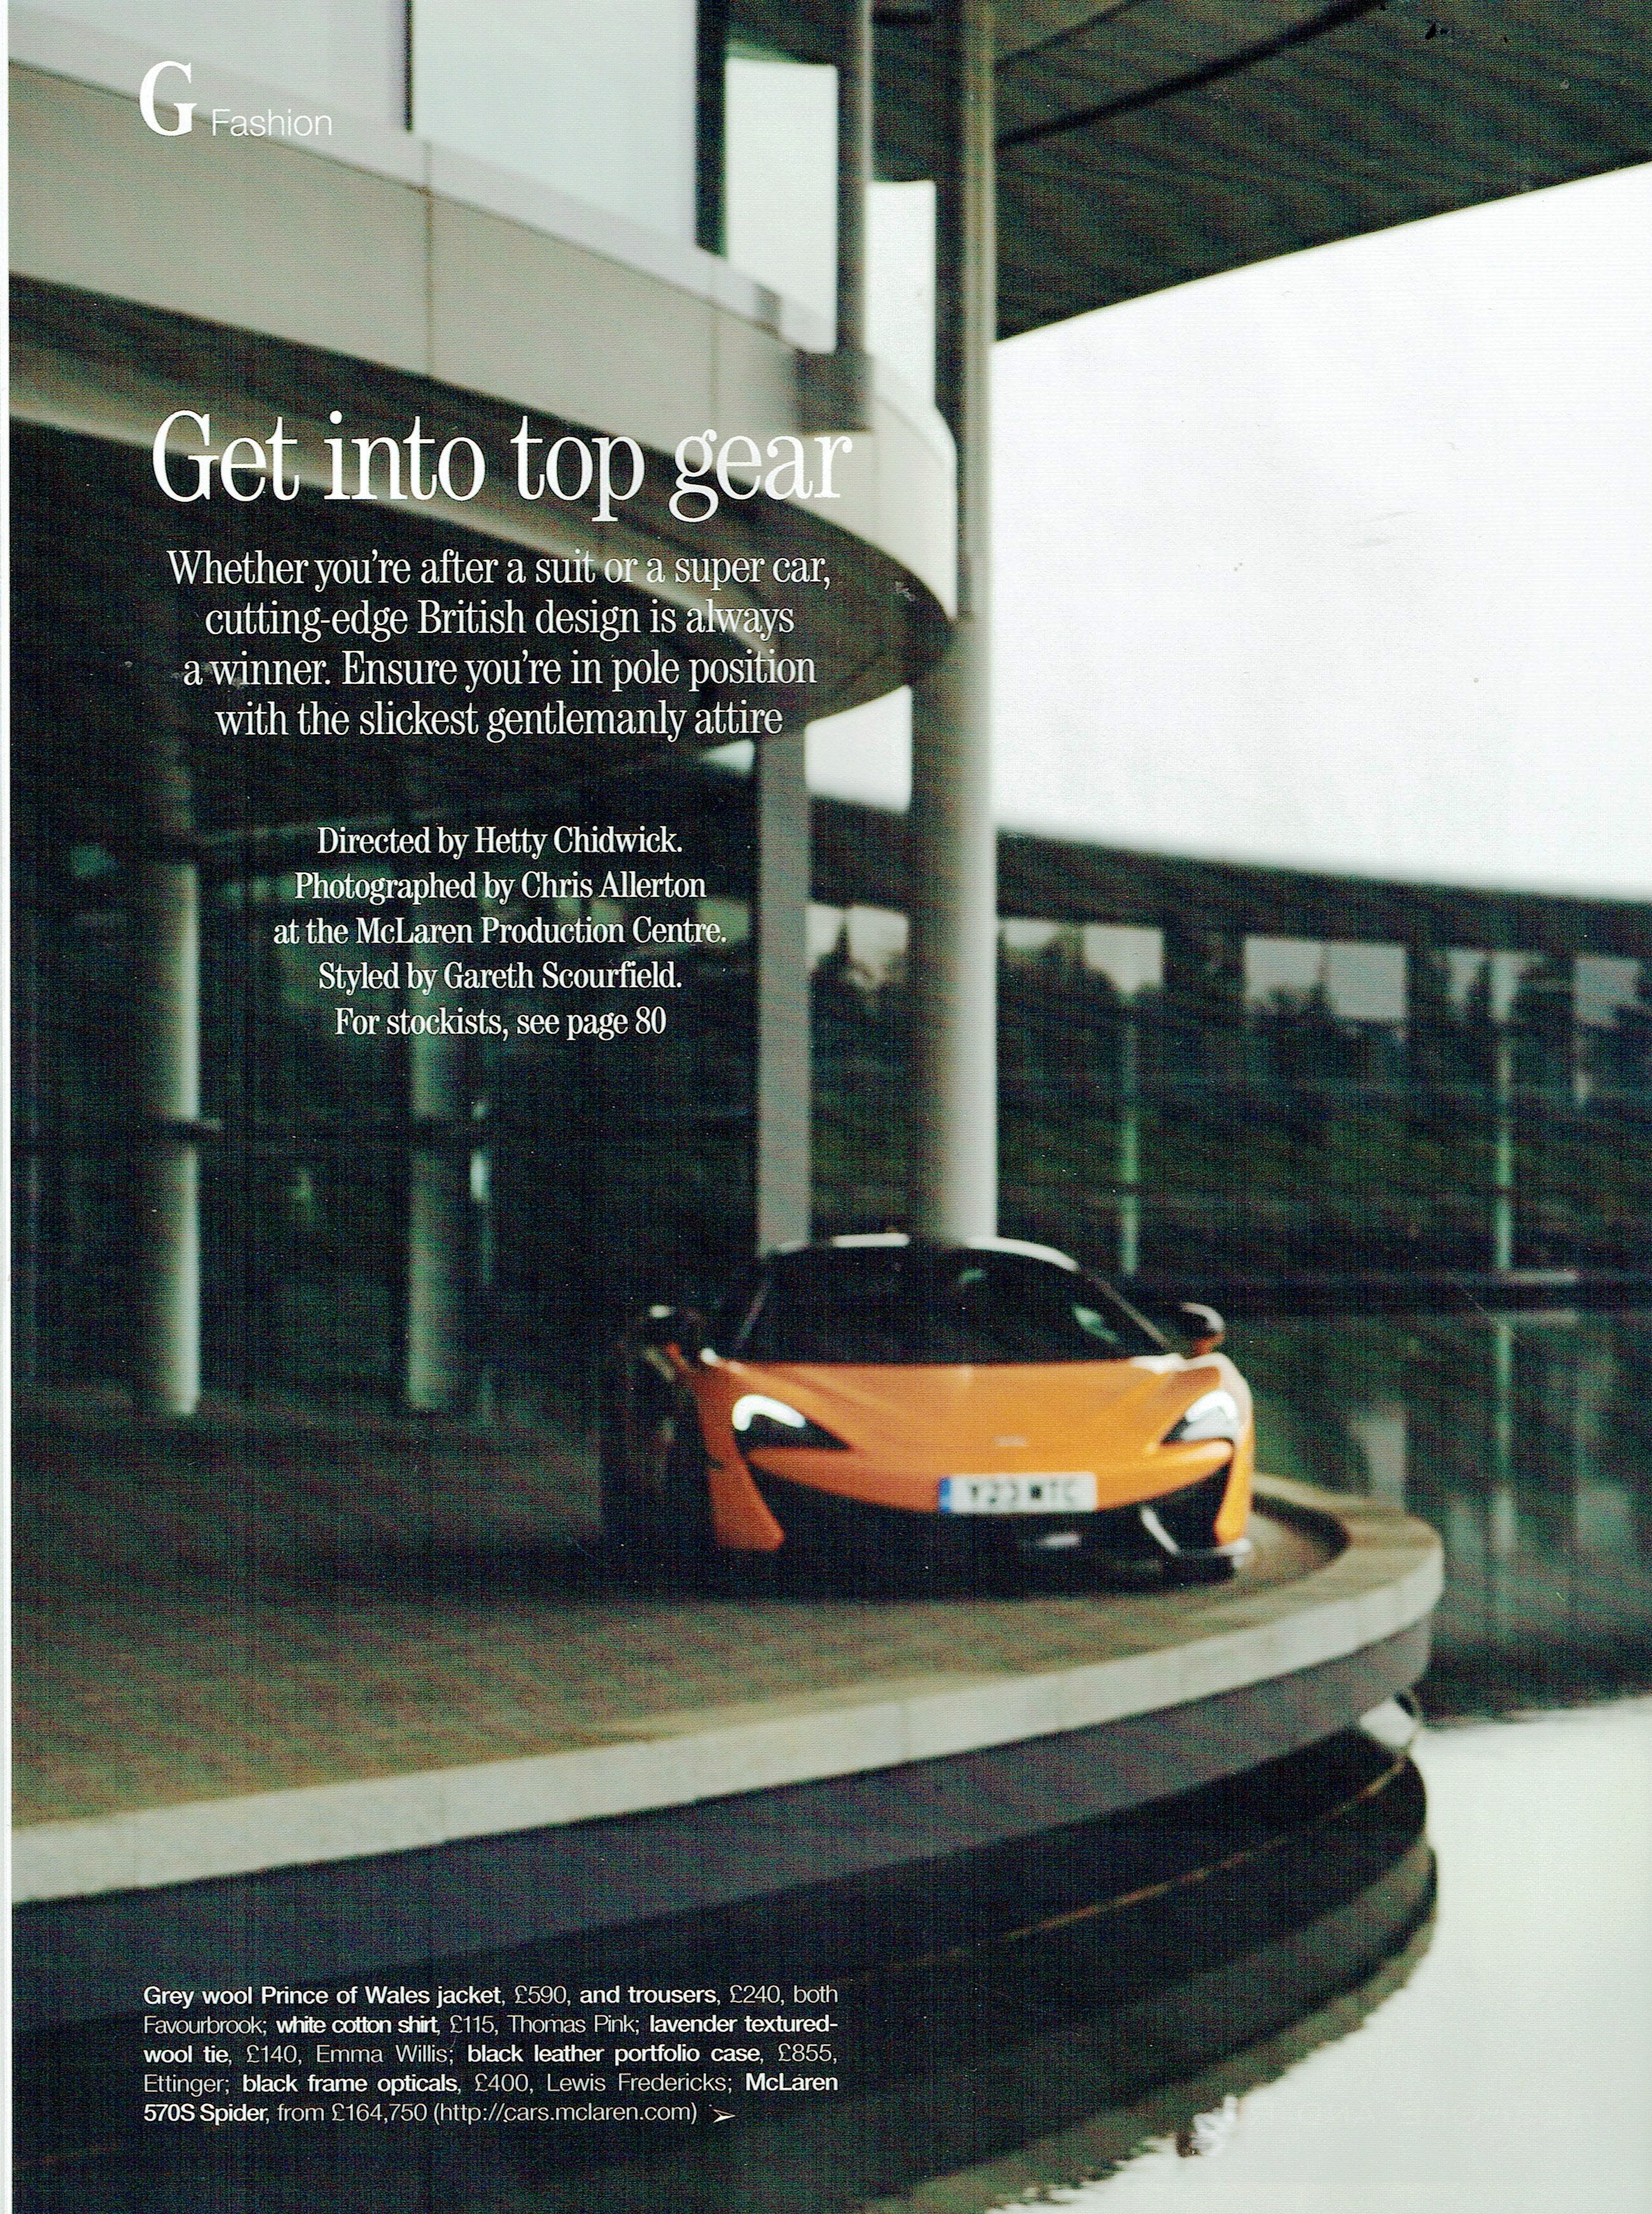 clip last lp news money huracan the supercar hurac lamborghini review spyder coupe n trunk true